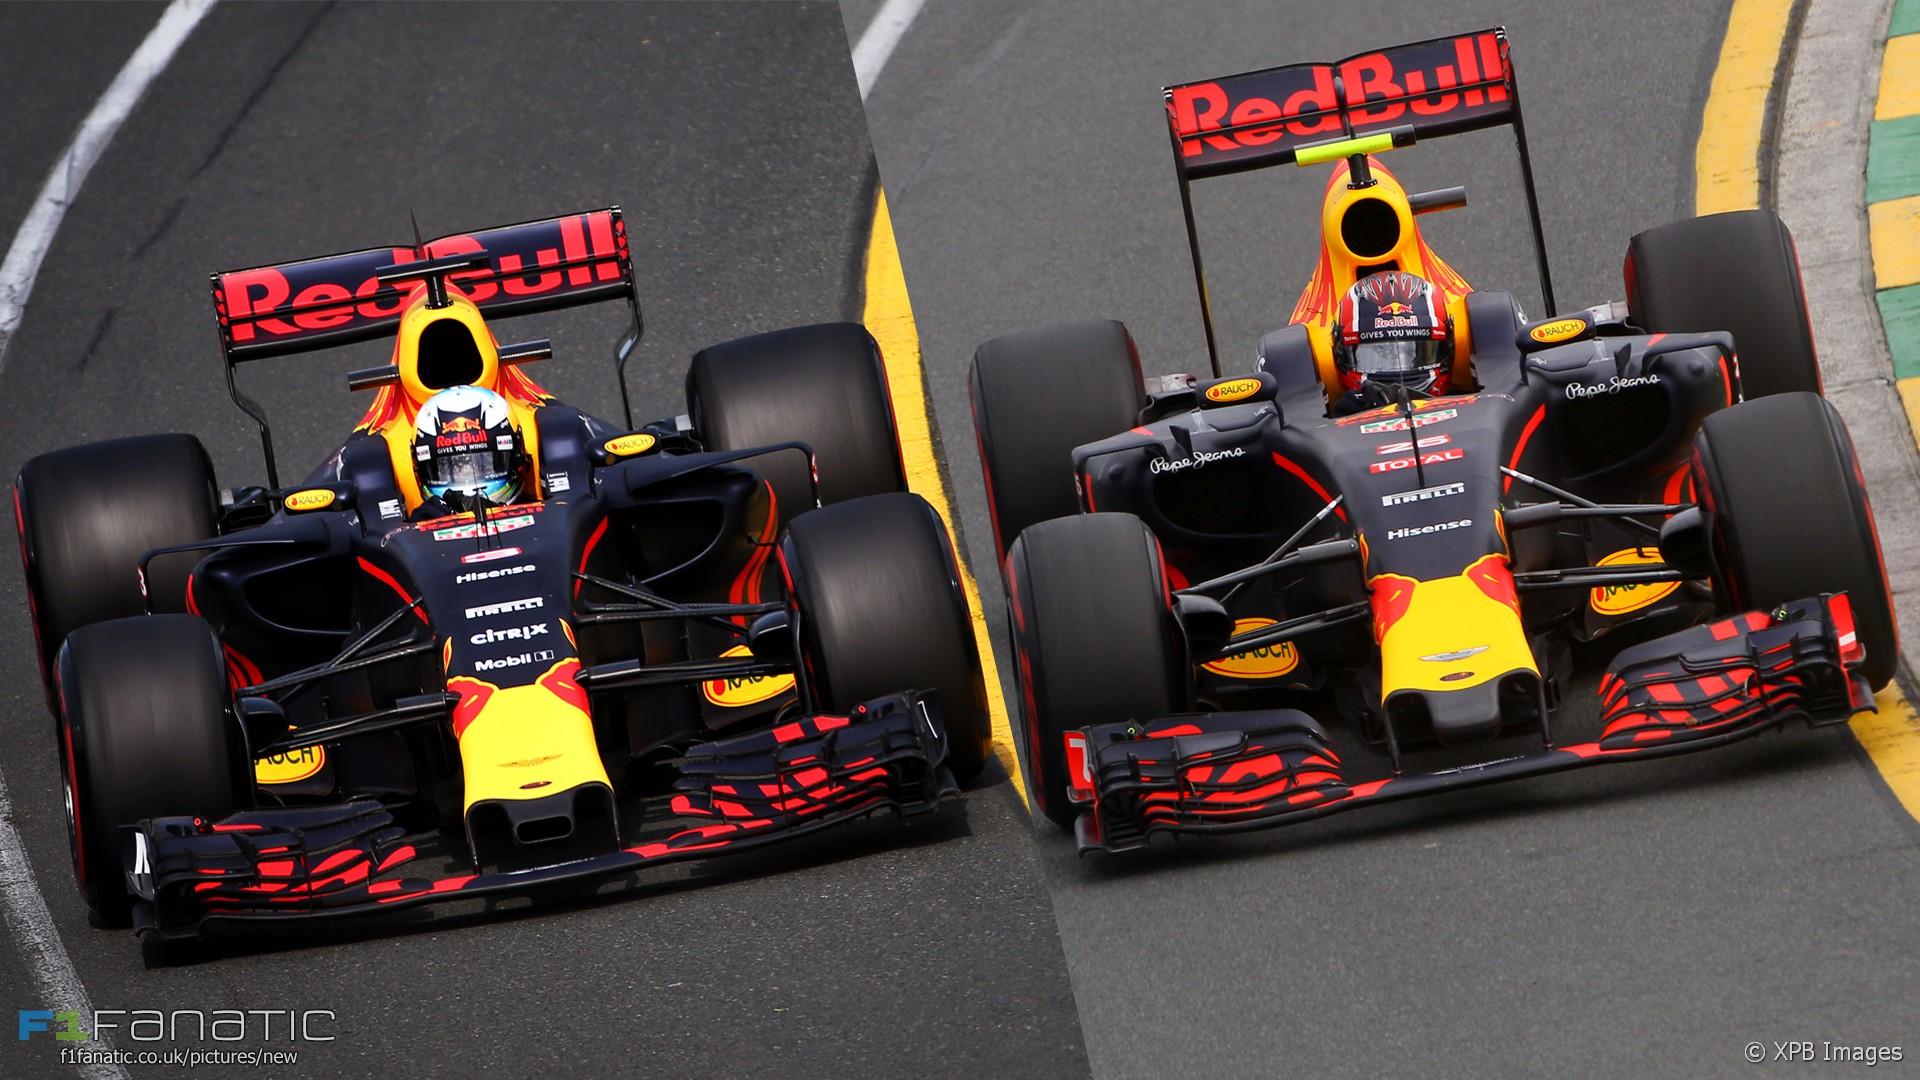 Broken Car Pictures Wallpaper Cornering Speed Of An F1 2017 Car Videos